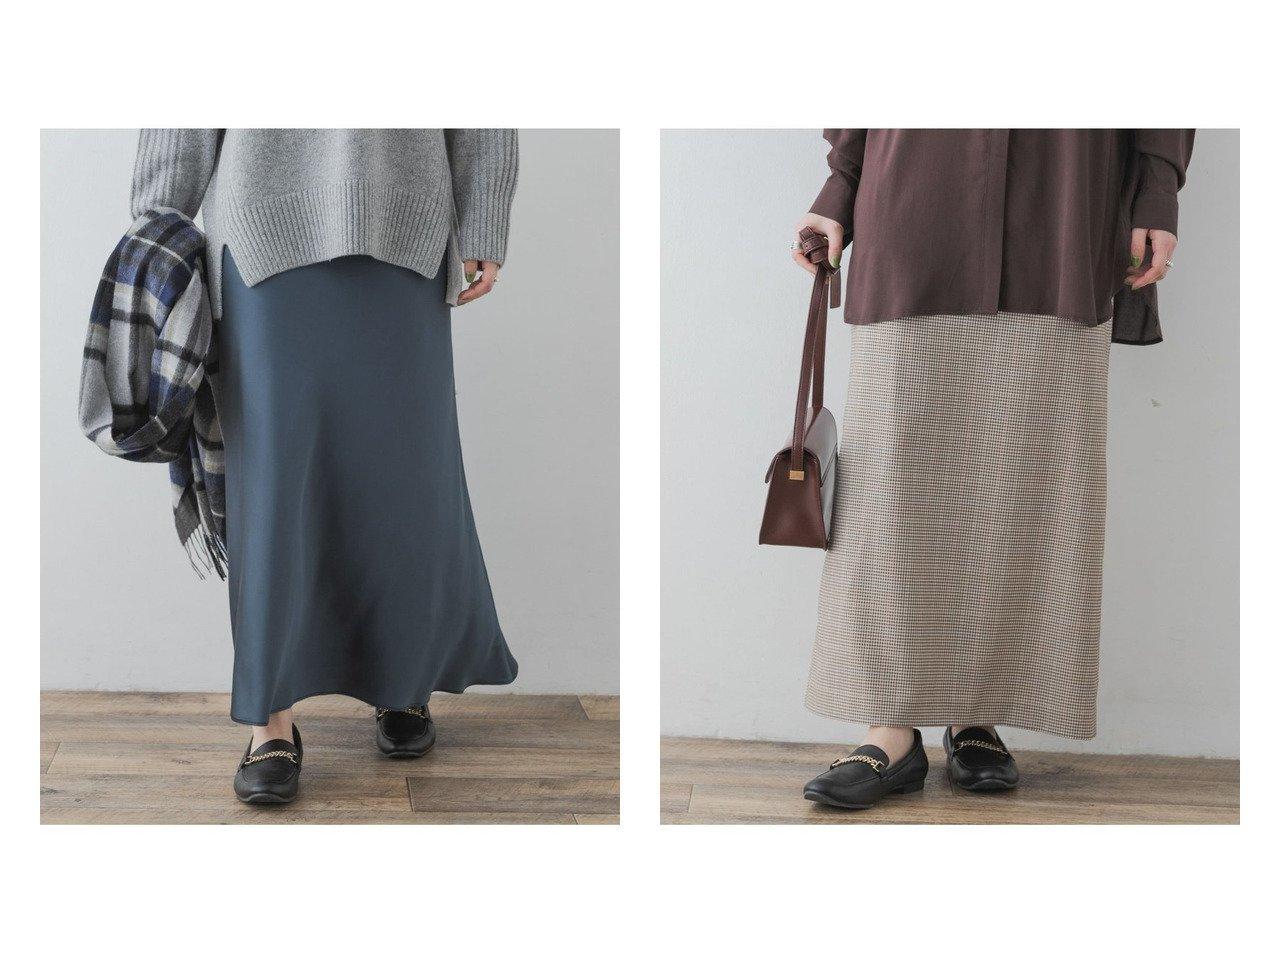 【URBAN RESEARCH ROSSO/アーバンリサーチ ロッソ】のF by ROSSO サテンマーメイドスカート&F by ROSSO チェックロングスカート スカートのおすすめ!人気、トレンド・レディースファッションの通販 おすすめで人気の流行・トレンド、ファッションの通販商品 メンズファッション・キッズファッション・インテリア・家具・レディースファッション・服の通販 founy(ファニー) https://founy.com/ ファッション Fashion レディースファッション WOMEN スカート Skirt ロングスカート Long Skirt NEW・新作・新着・新入荷 New Arrivals サテン トレンド ポケット マーメイド 冬 Winter チェック 台形 |ID:crp329100000012896